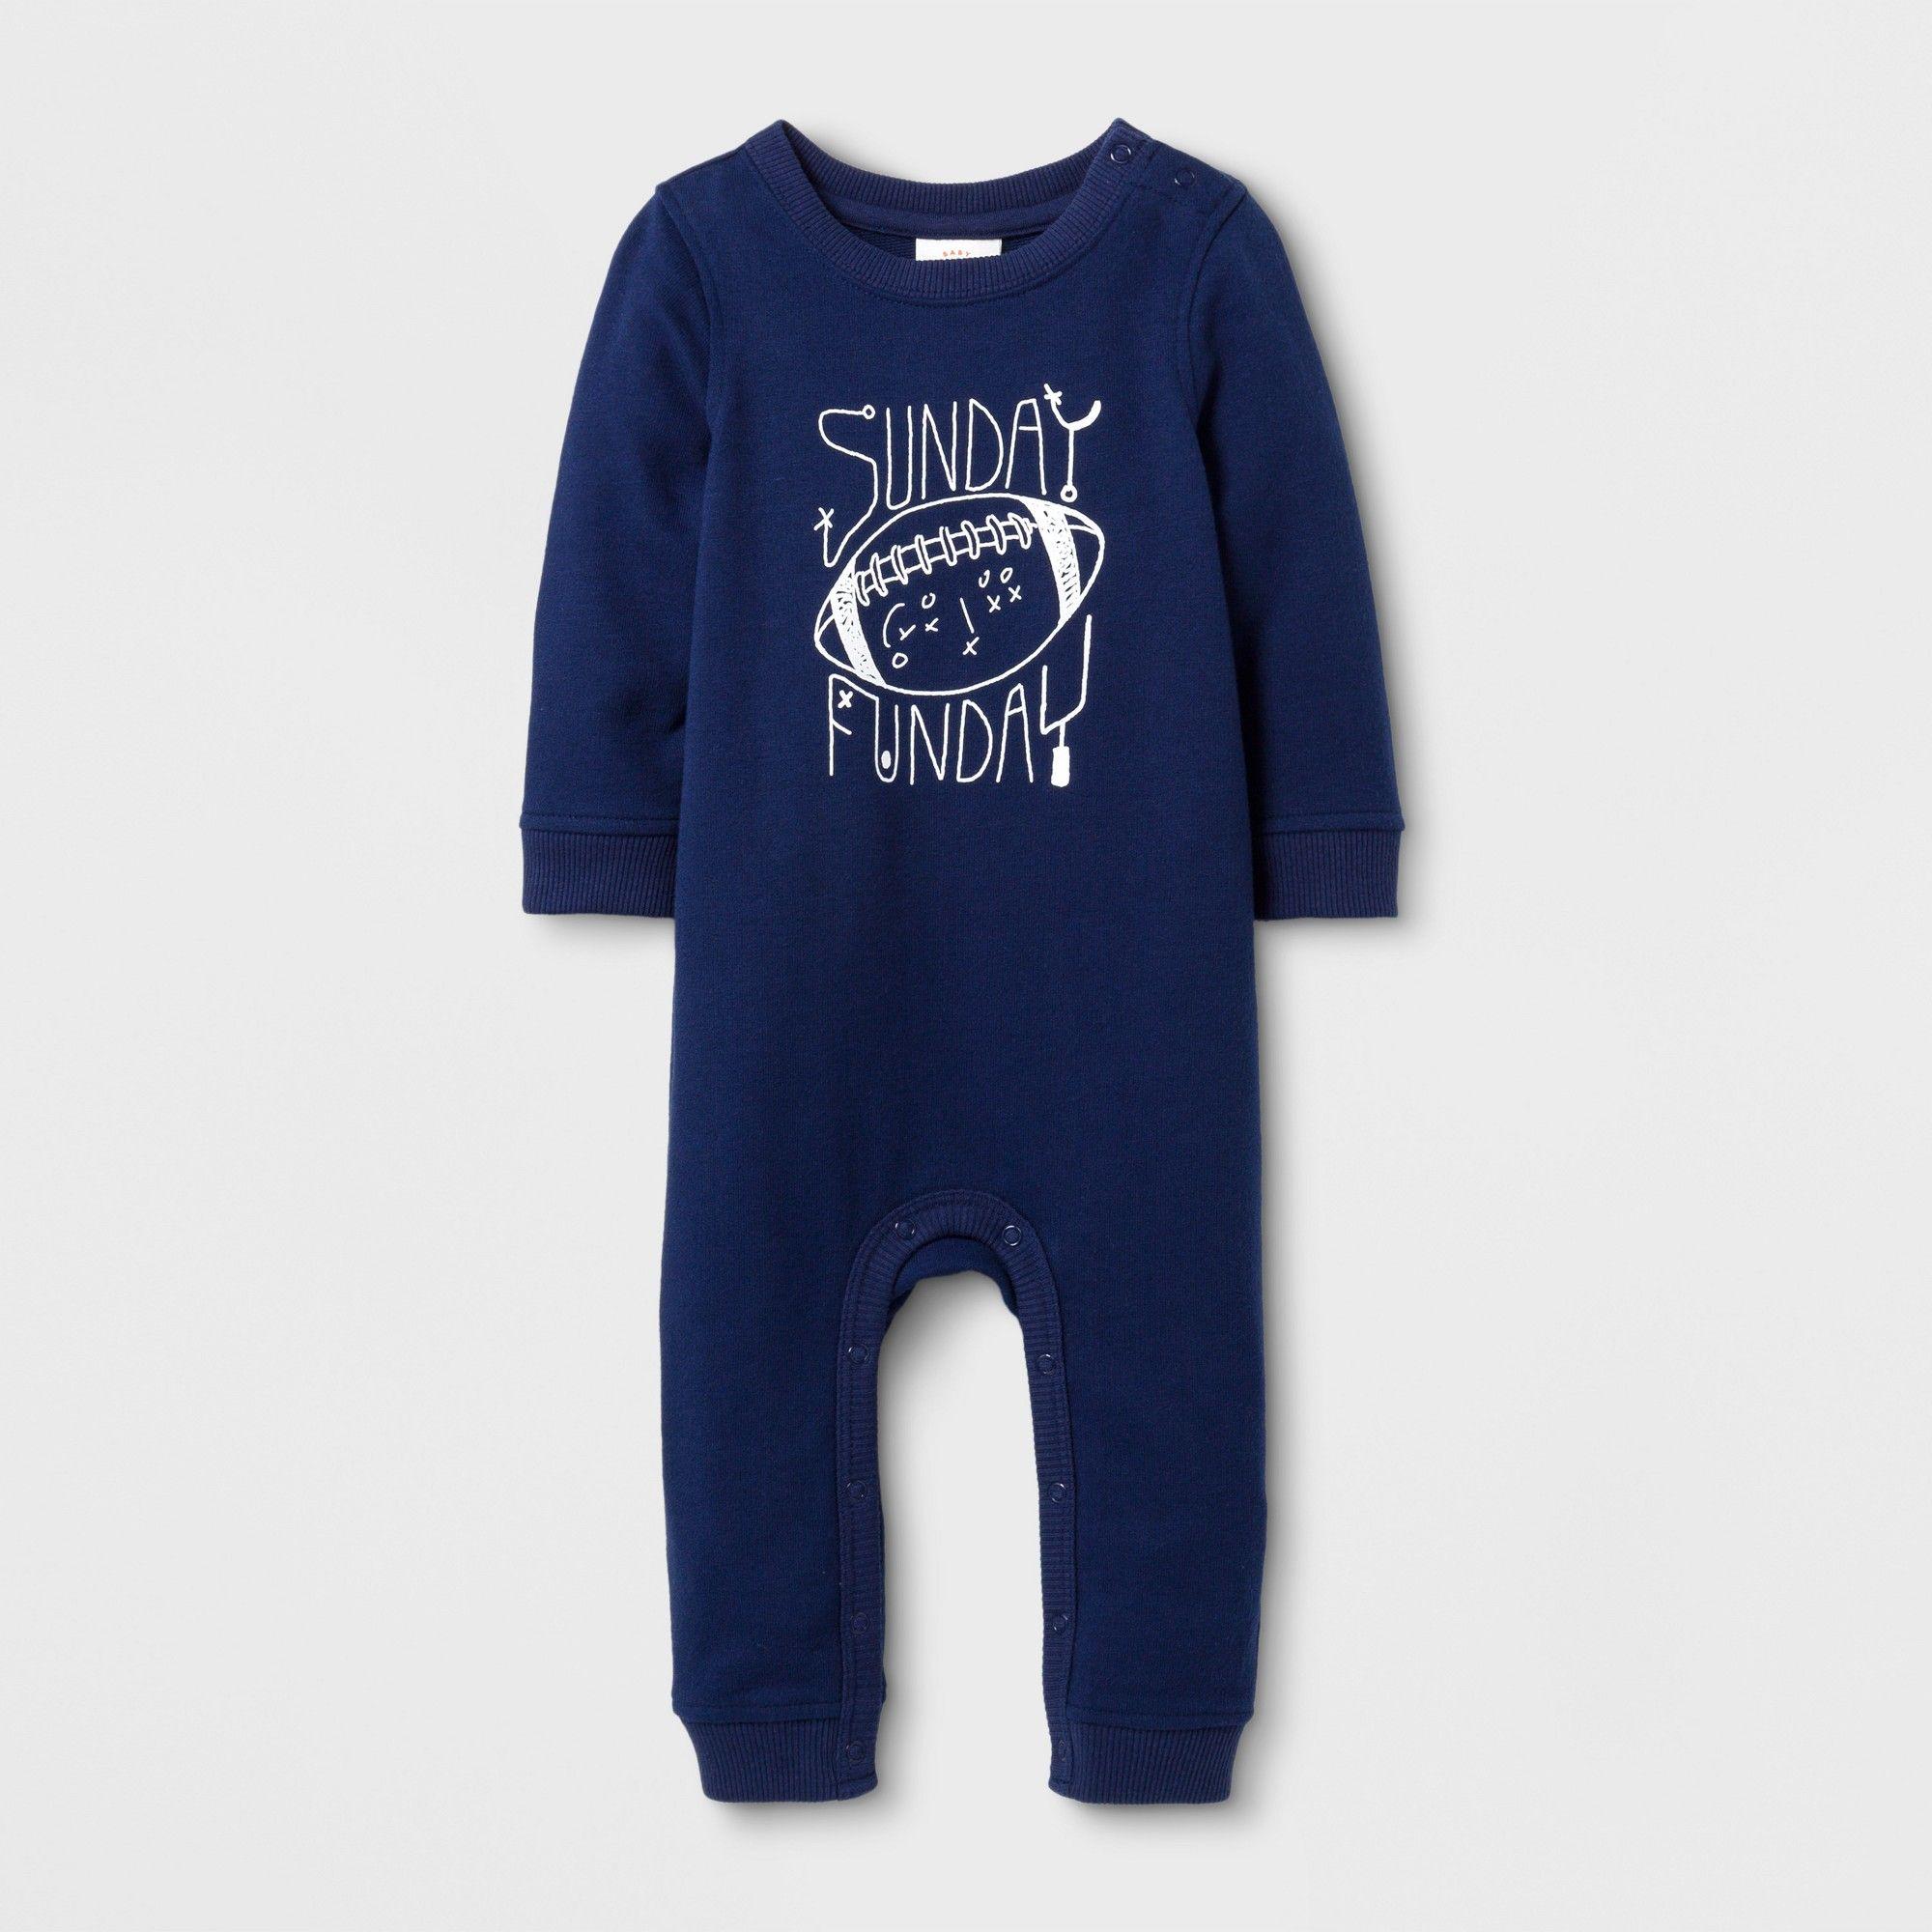 5453b8922 Baby Boys   sunday Funday  Long Sleeve Romper - Cat   Jack Blue 6-9M ...